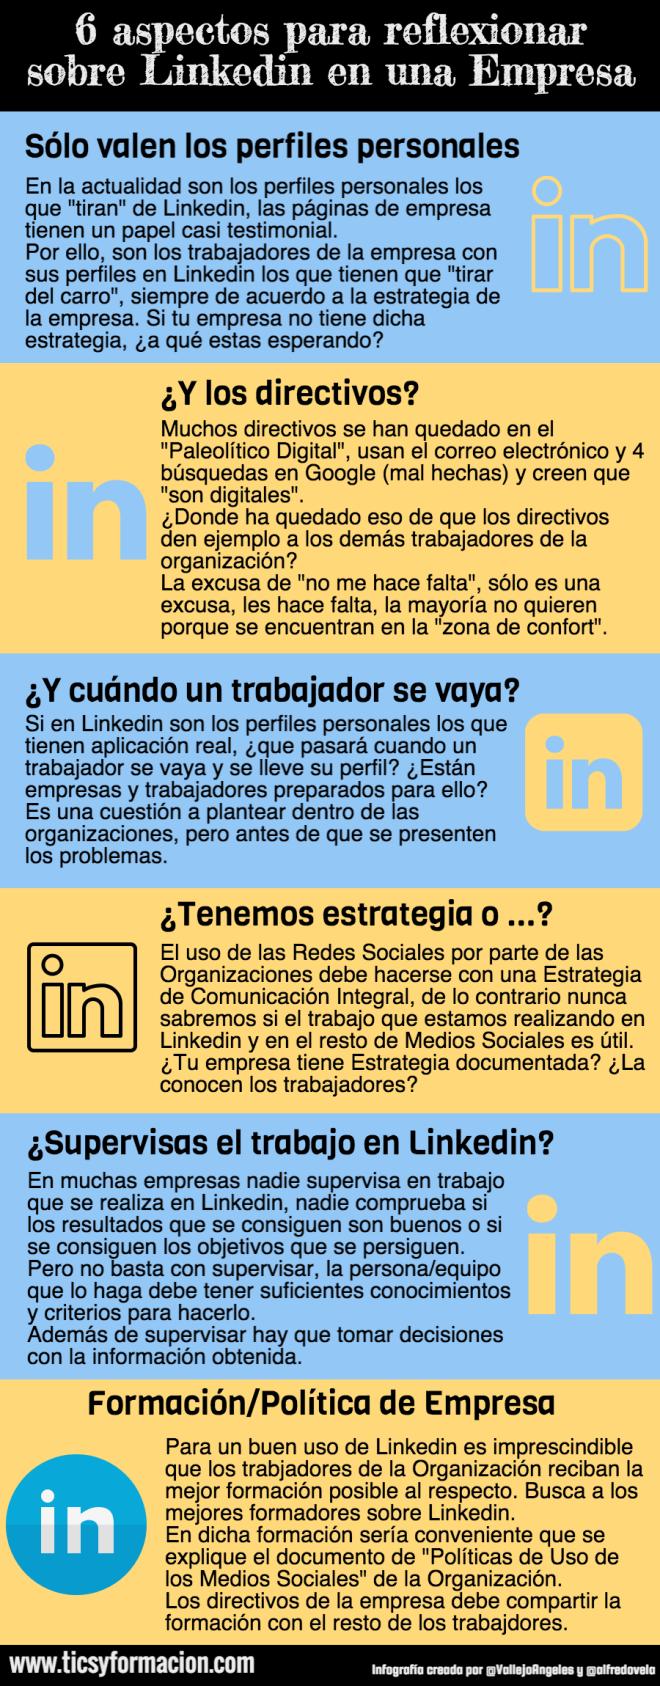 6 aspectos para reflexionar sobre Linkedin en una Empresa